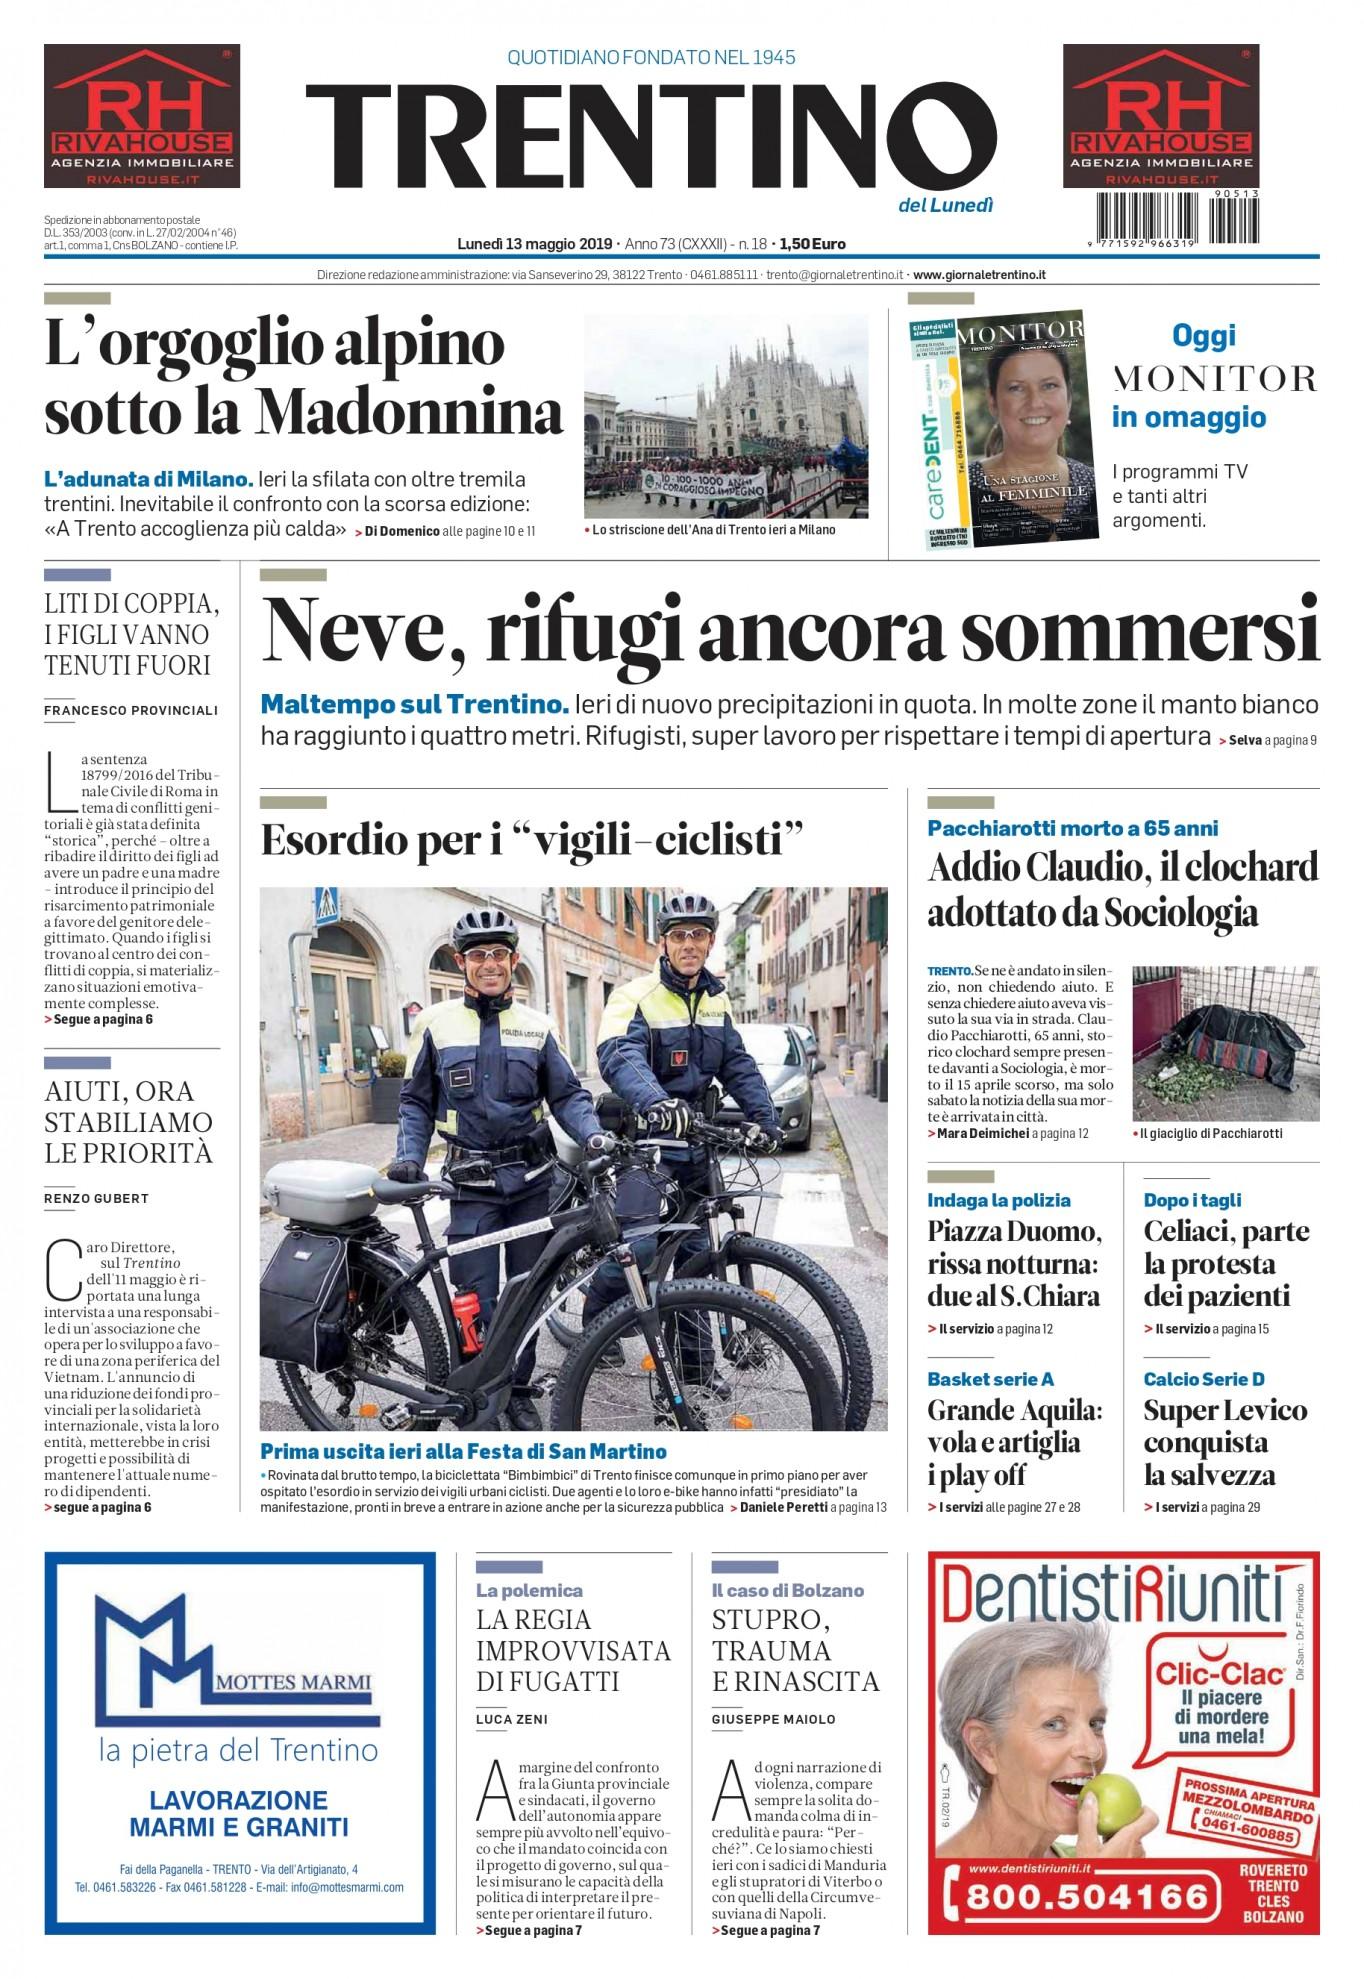 Trentino-13.05.2019-01_page-0001